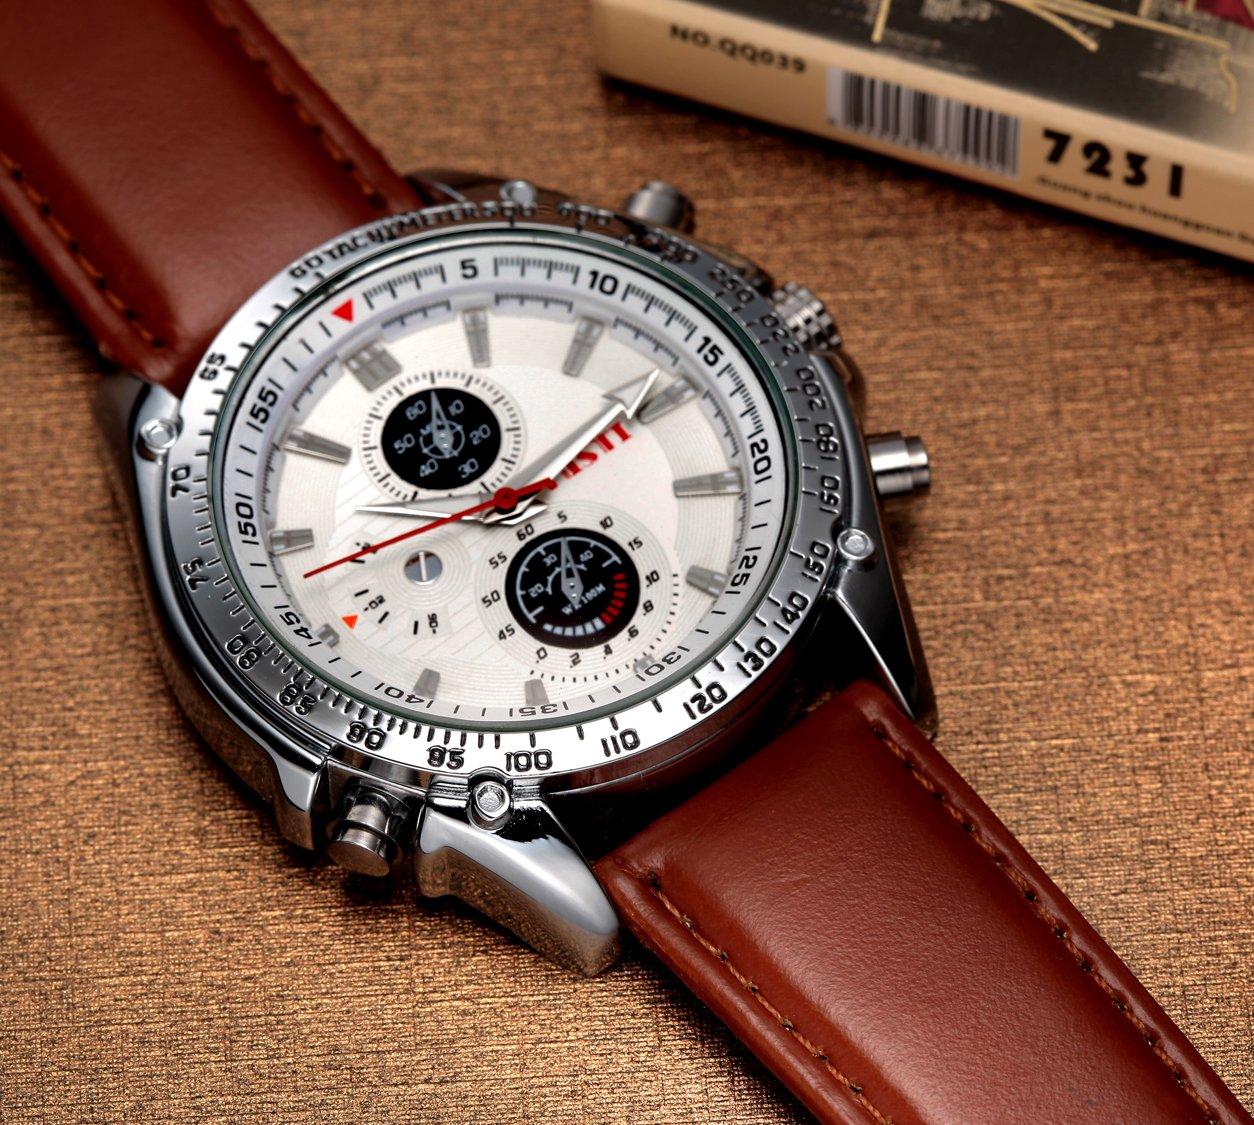 Mens Quartz Watch, Roman Numeral Business Casual Fashion Wrist watch, PU Strap Leather Watch Brown